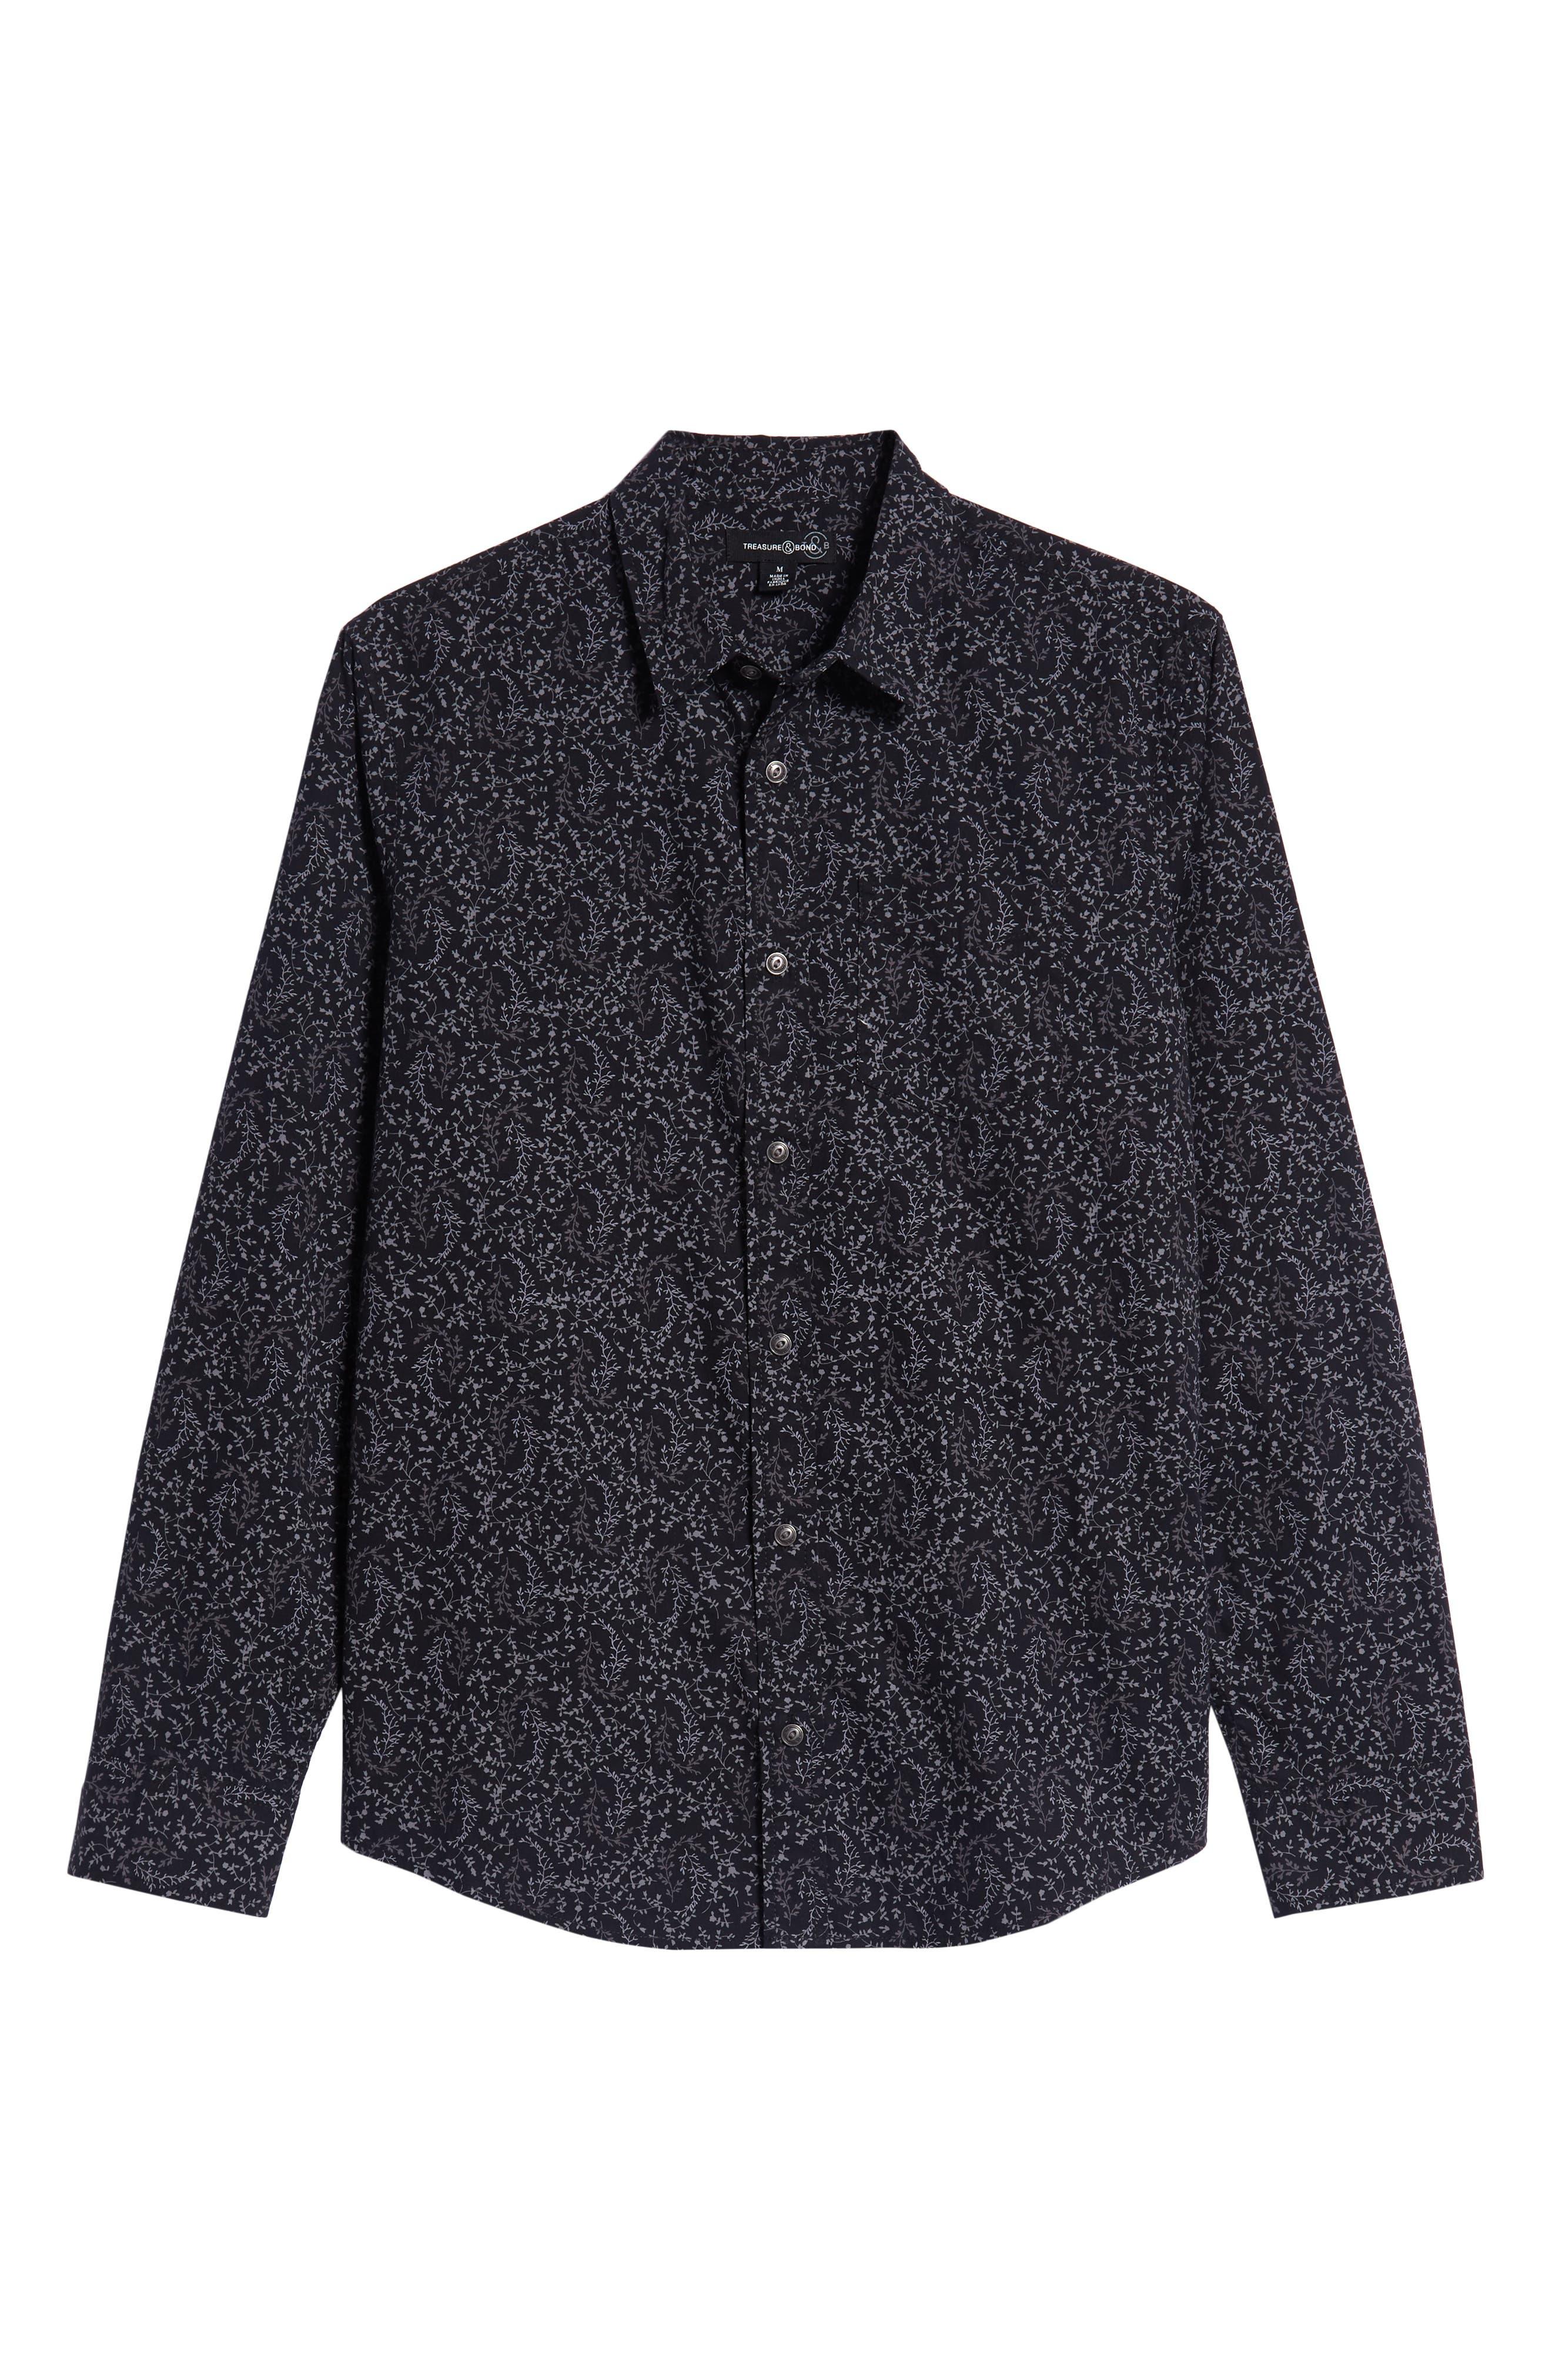 Regular Fit Print Sport Shirt,                             Alternate thumbnail 6, color,                             BLACK ROCK TUMBLEWEED